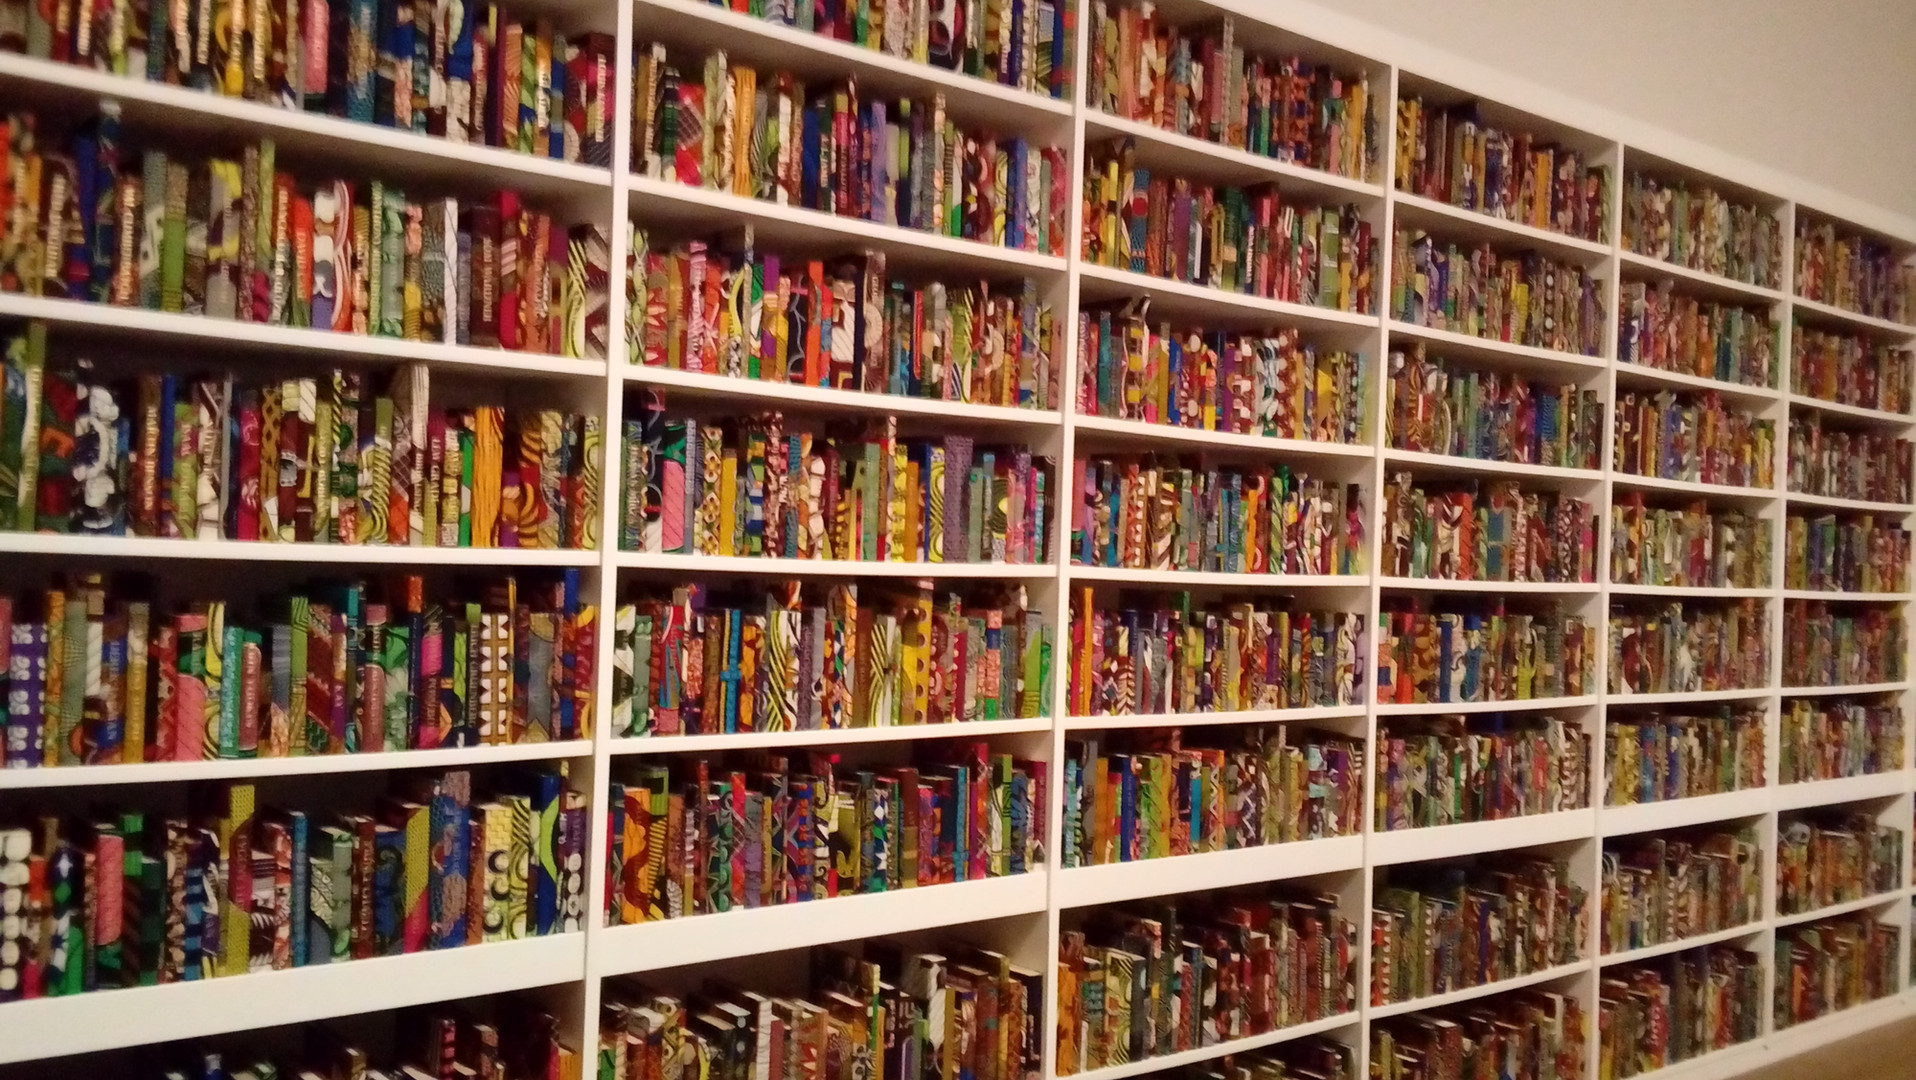 Yinka Shonibare, The British Library, 2014